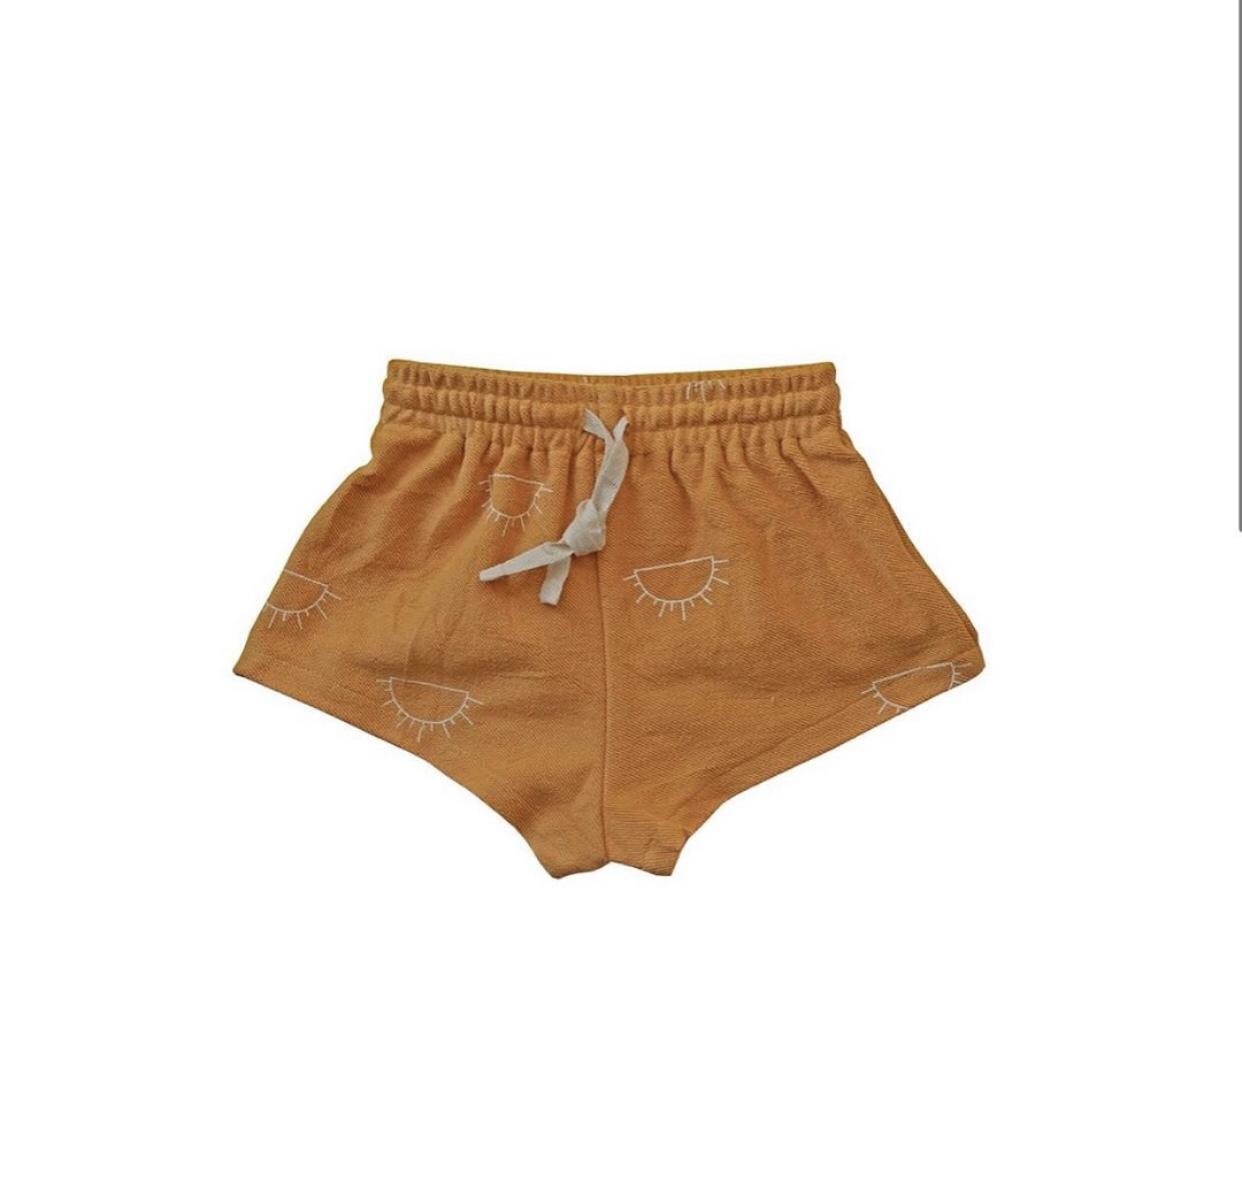 Children's Apparel Summer Collection california asheville designer pattern t-shirt apparel shorts outline sunshine sun kids clothing